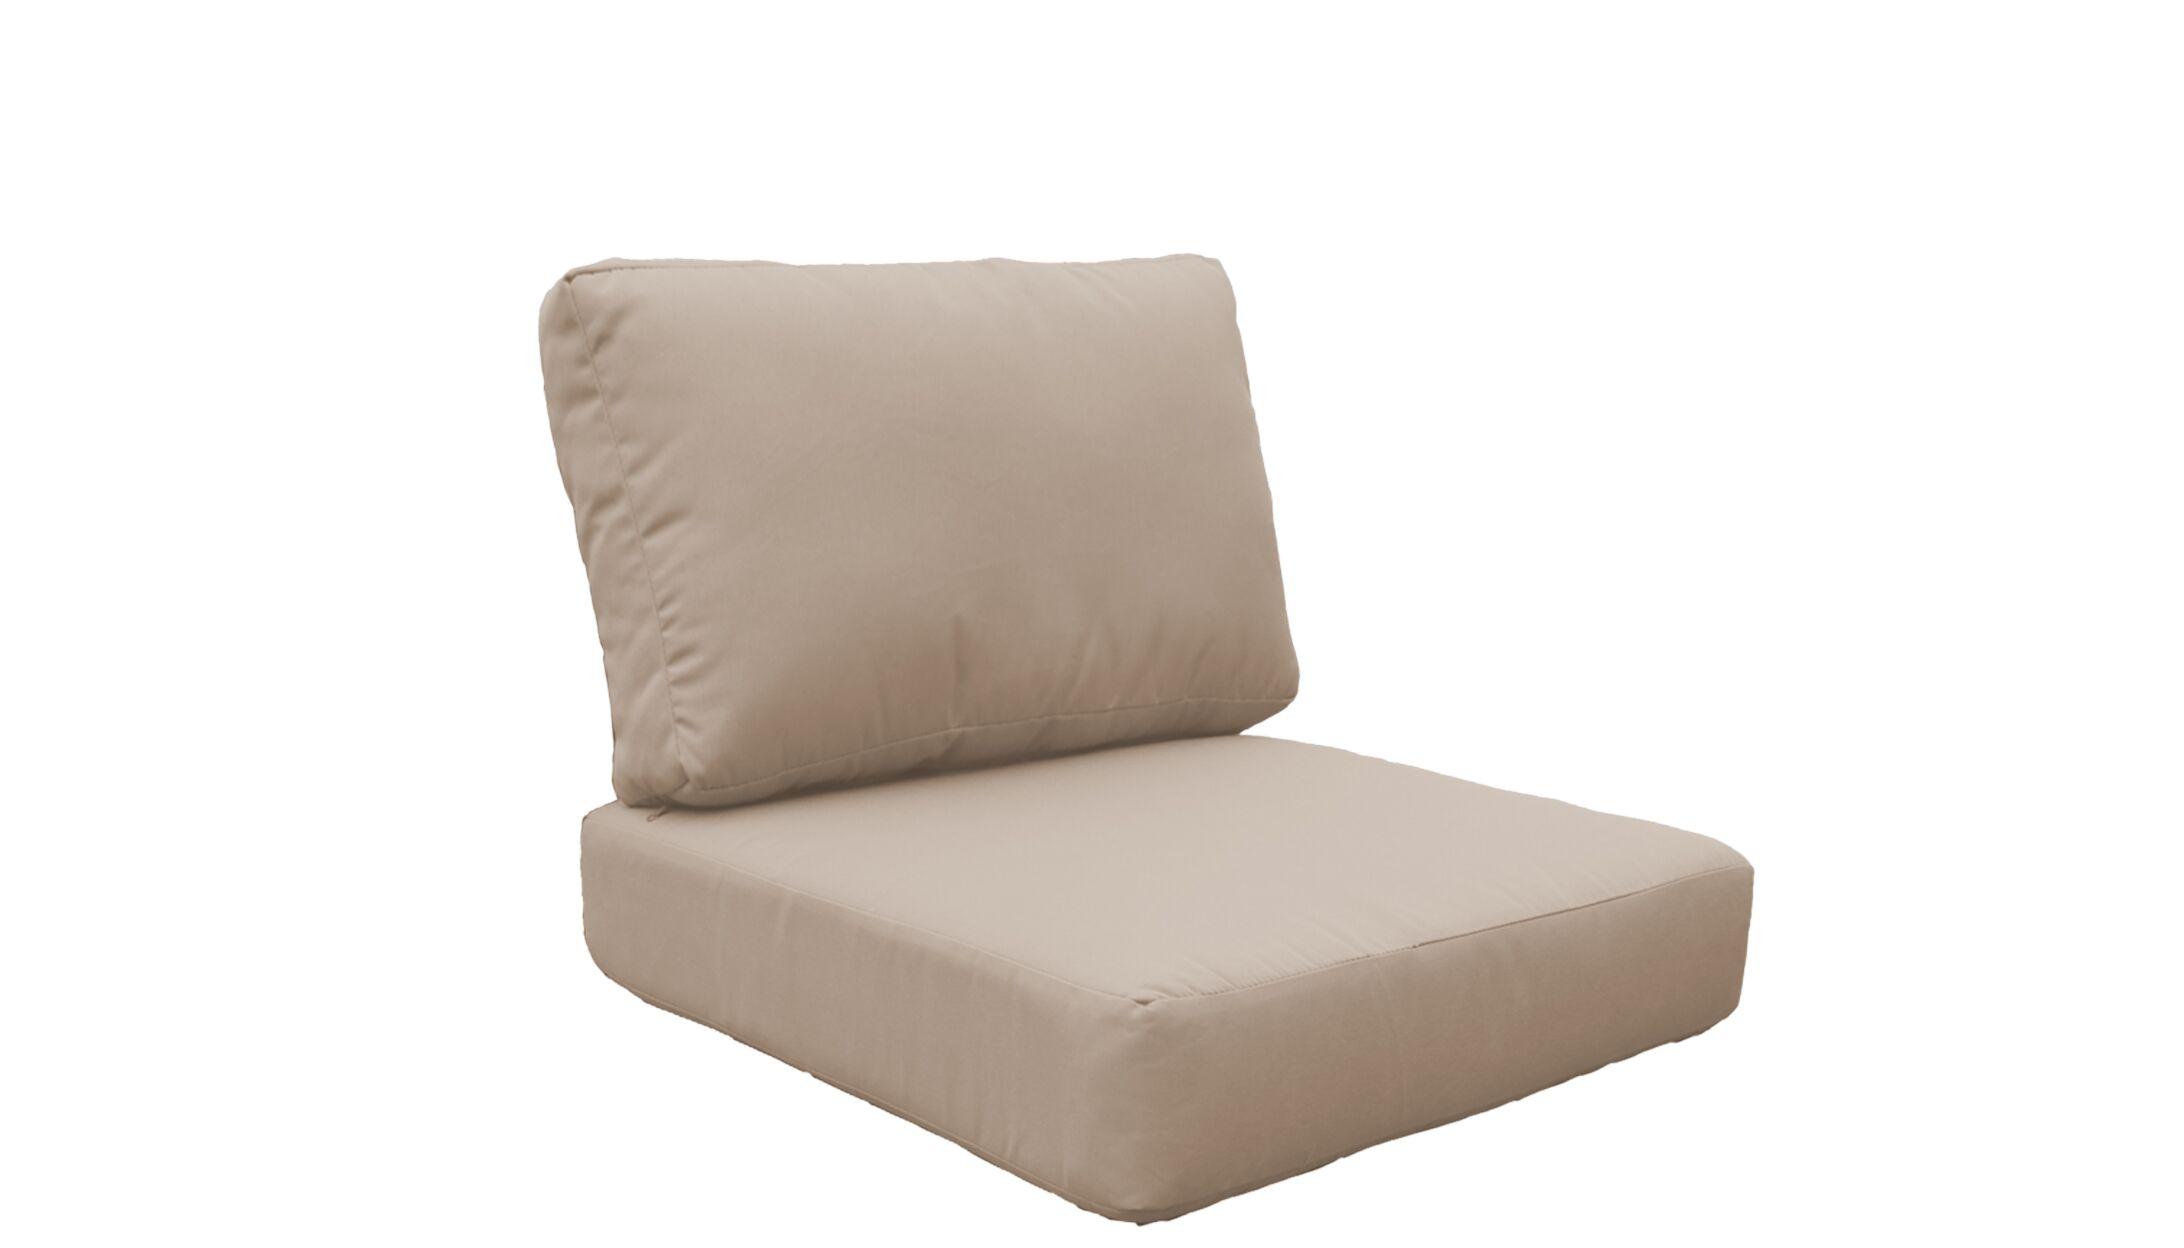 Fairmont 4 Piece Outdoor�Lounge Chair Cushion Set Fabric: Wheat